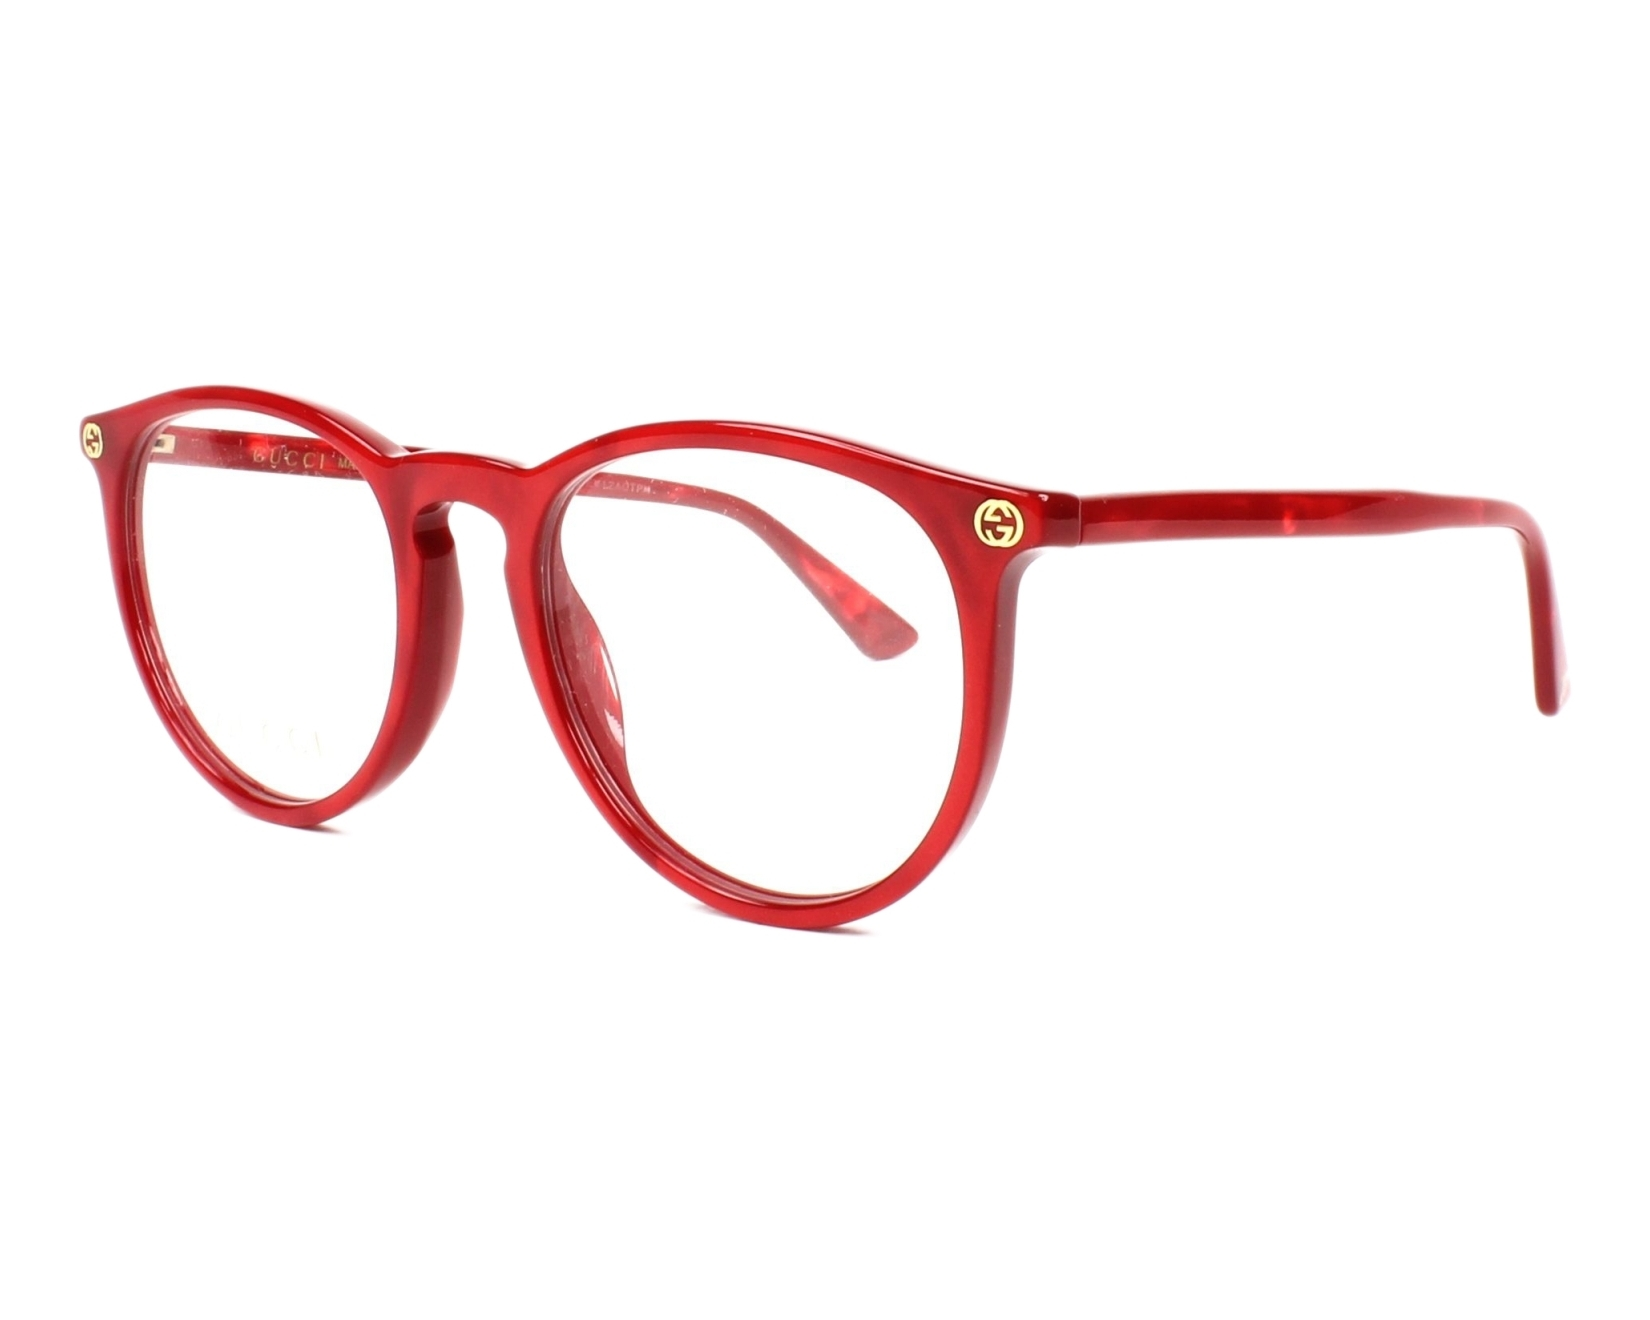 Buy Gucci Eyeglasses GG-00270 004 Online - Visionet